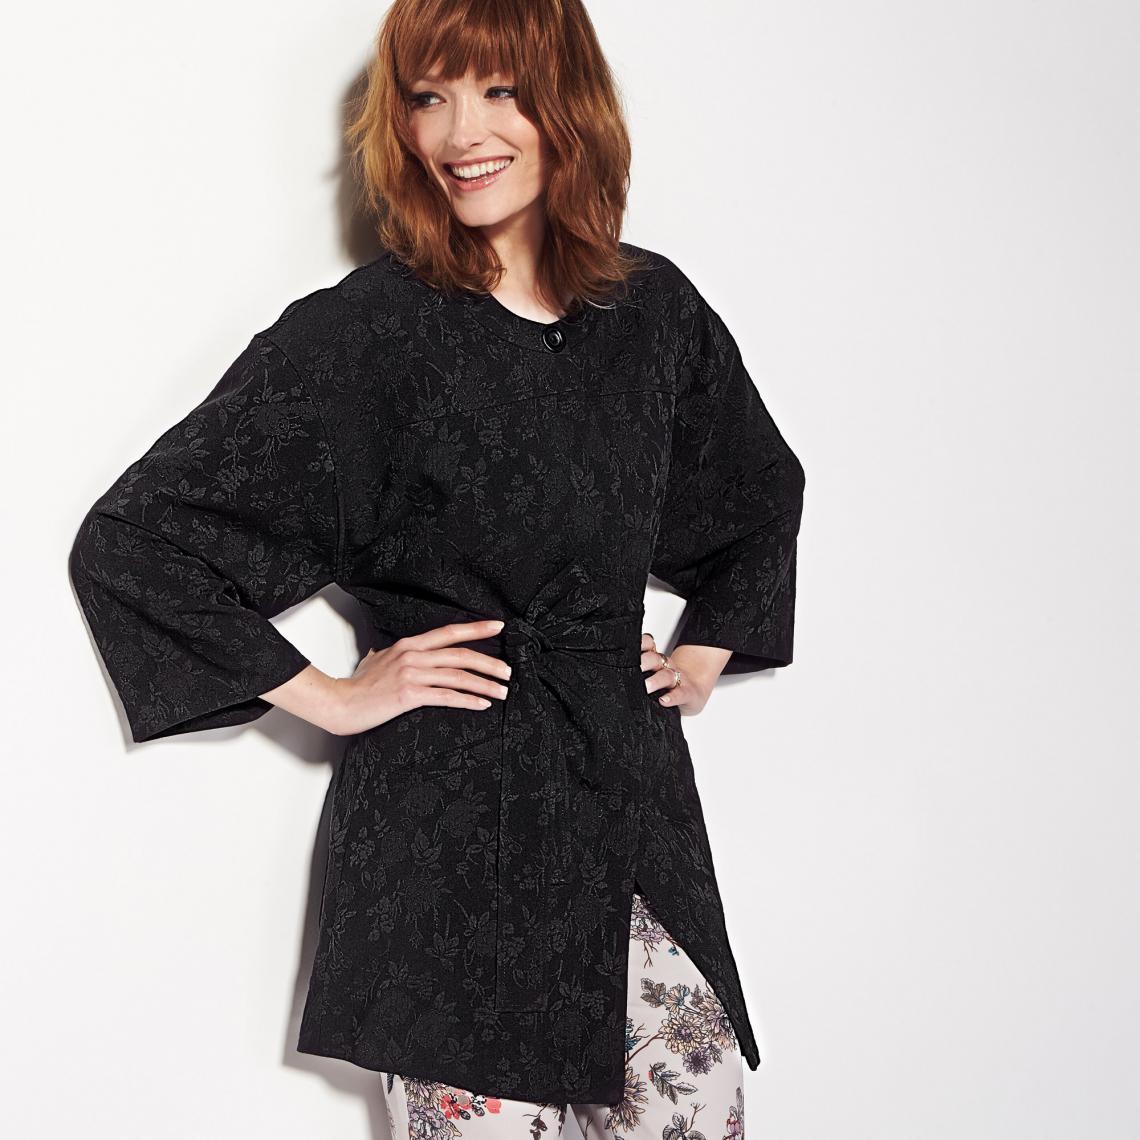 Manteau esprit kimono collection - 3 SUISSES - Modalova